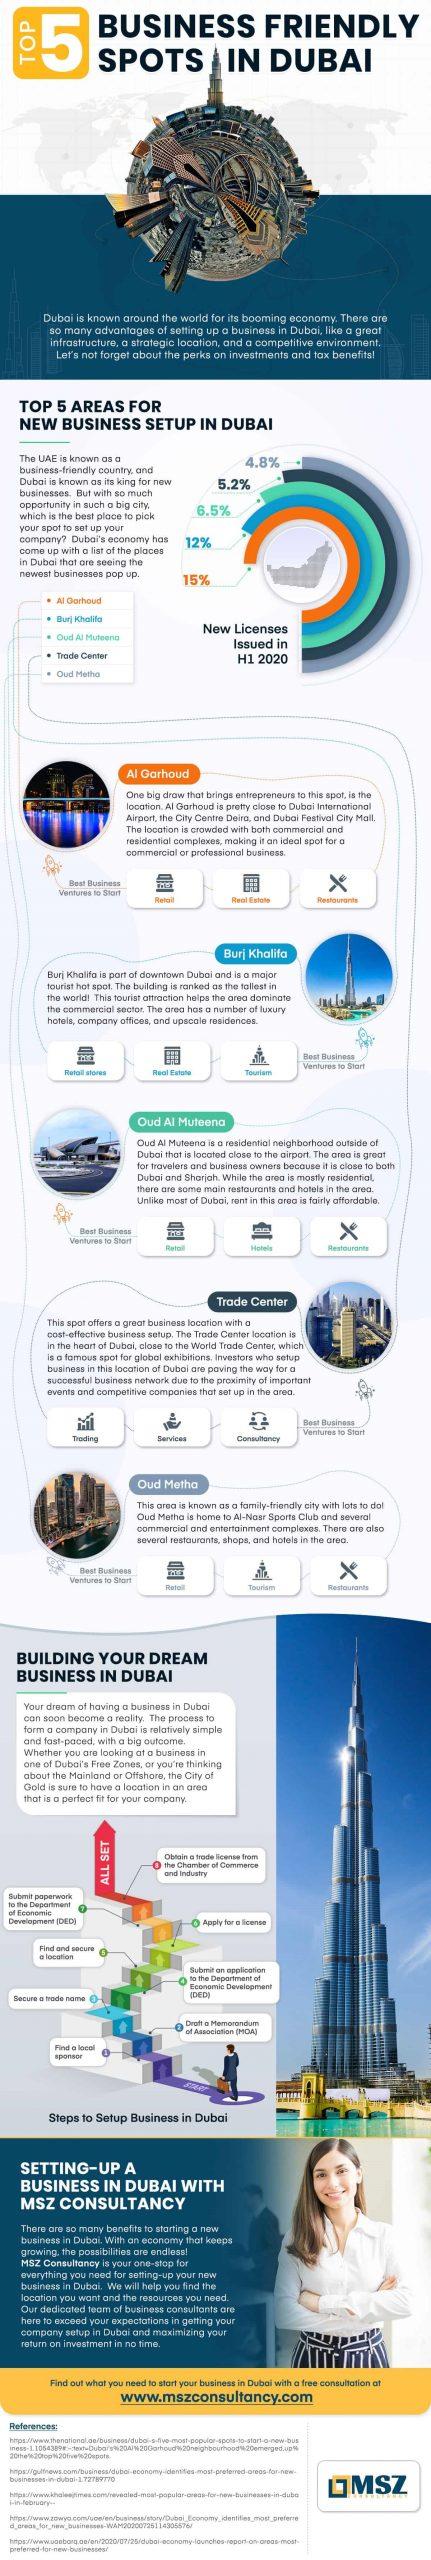 Business Spots of Dubai